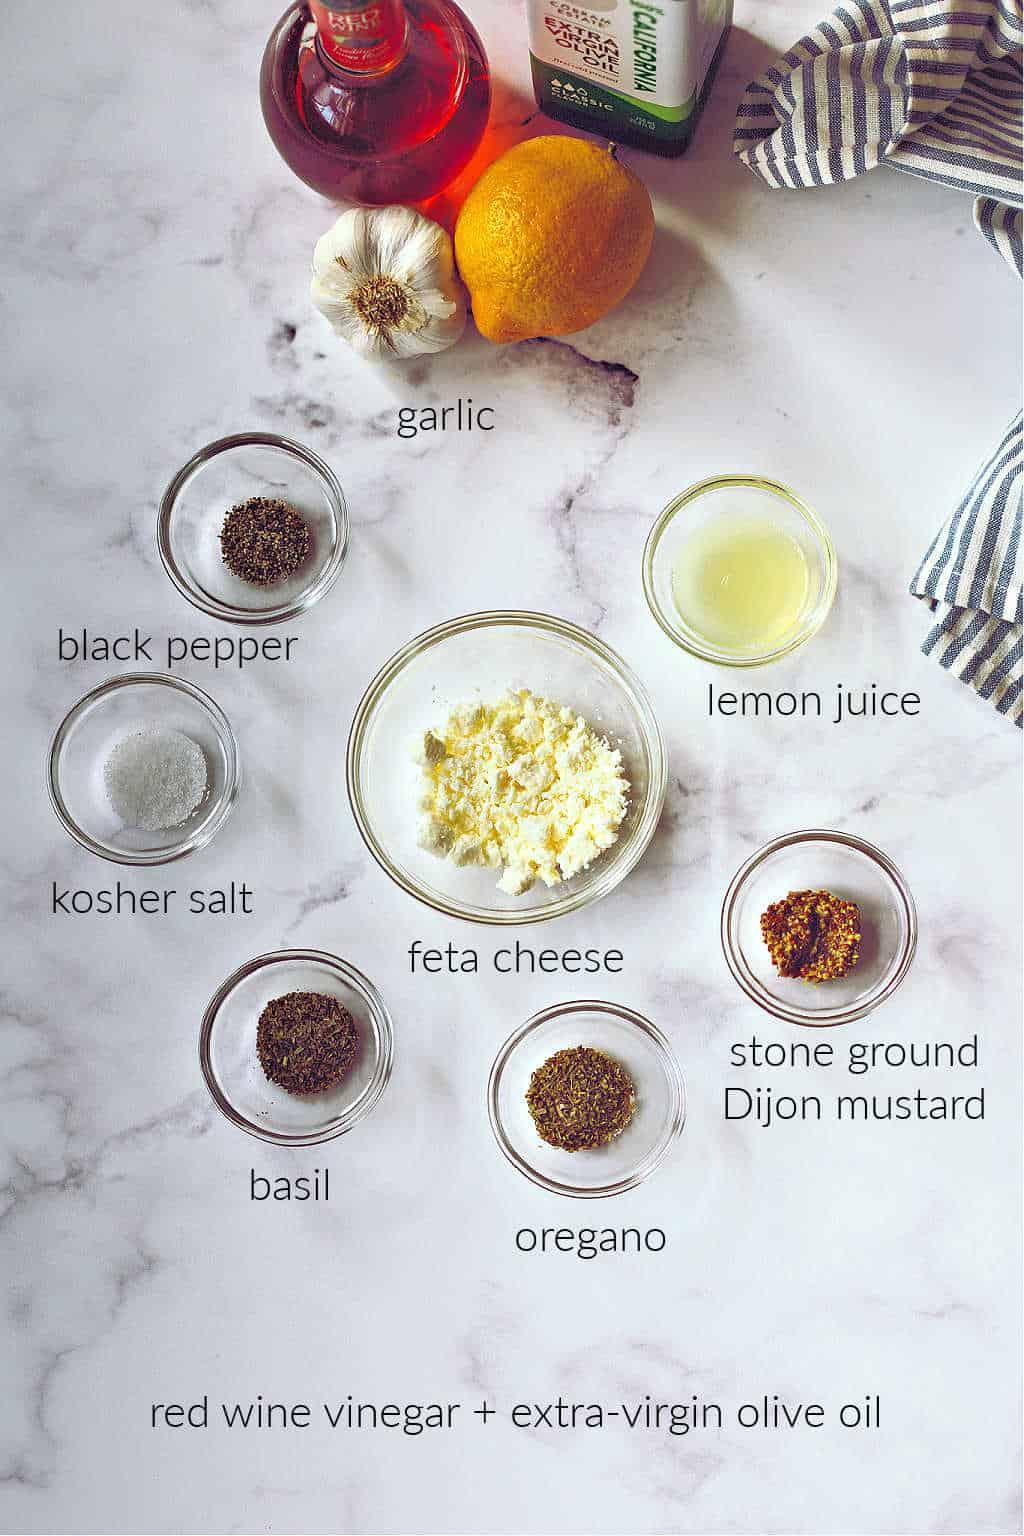 ingredients for greek salad dressing